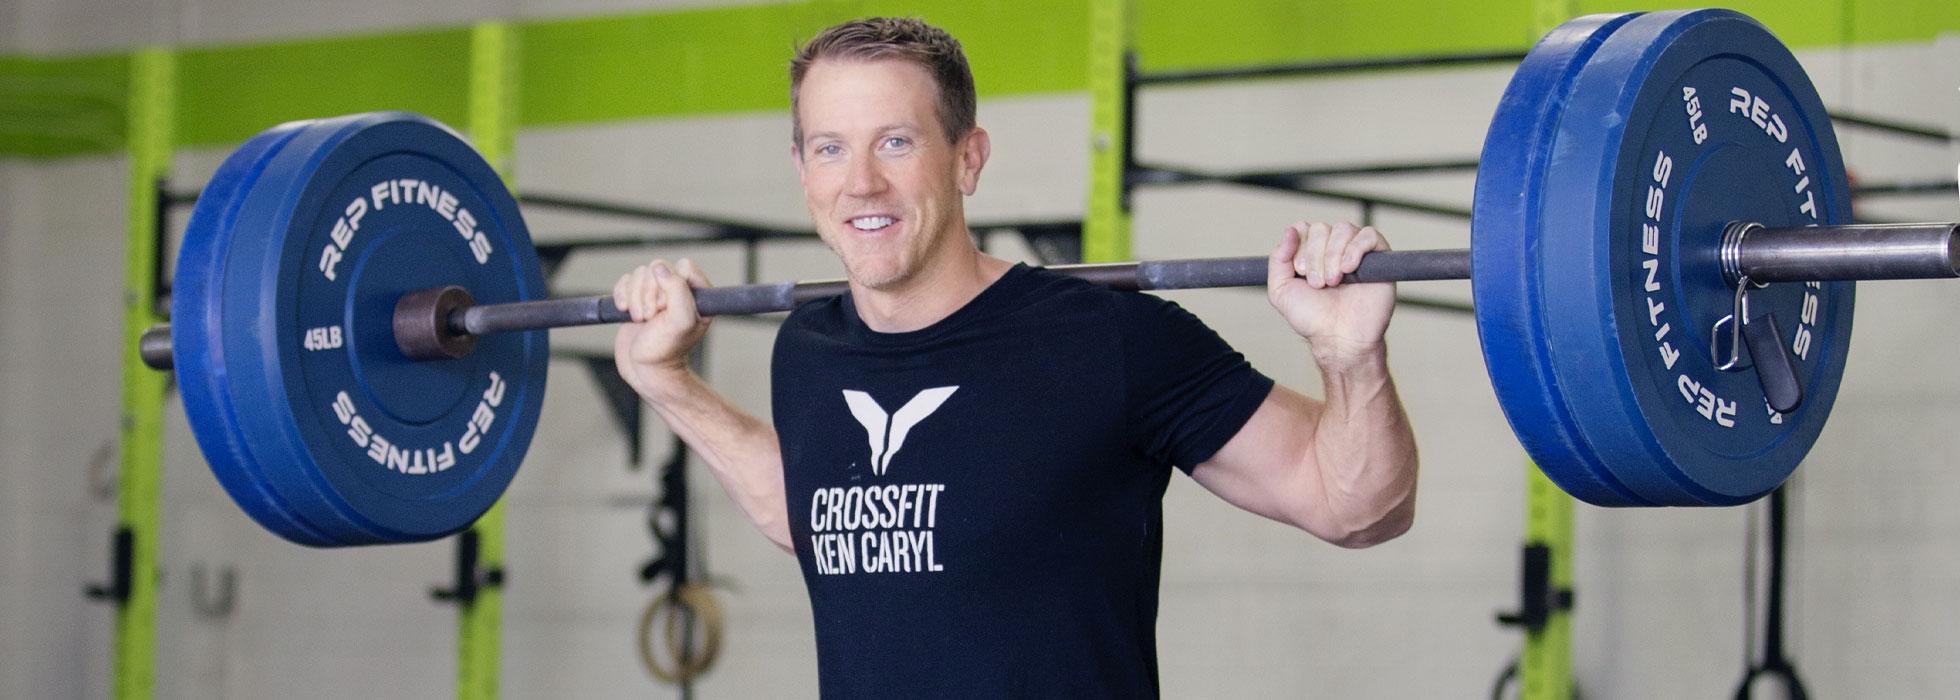 CrossFit Gym Near Me In Littleton, Colorado